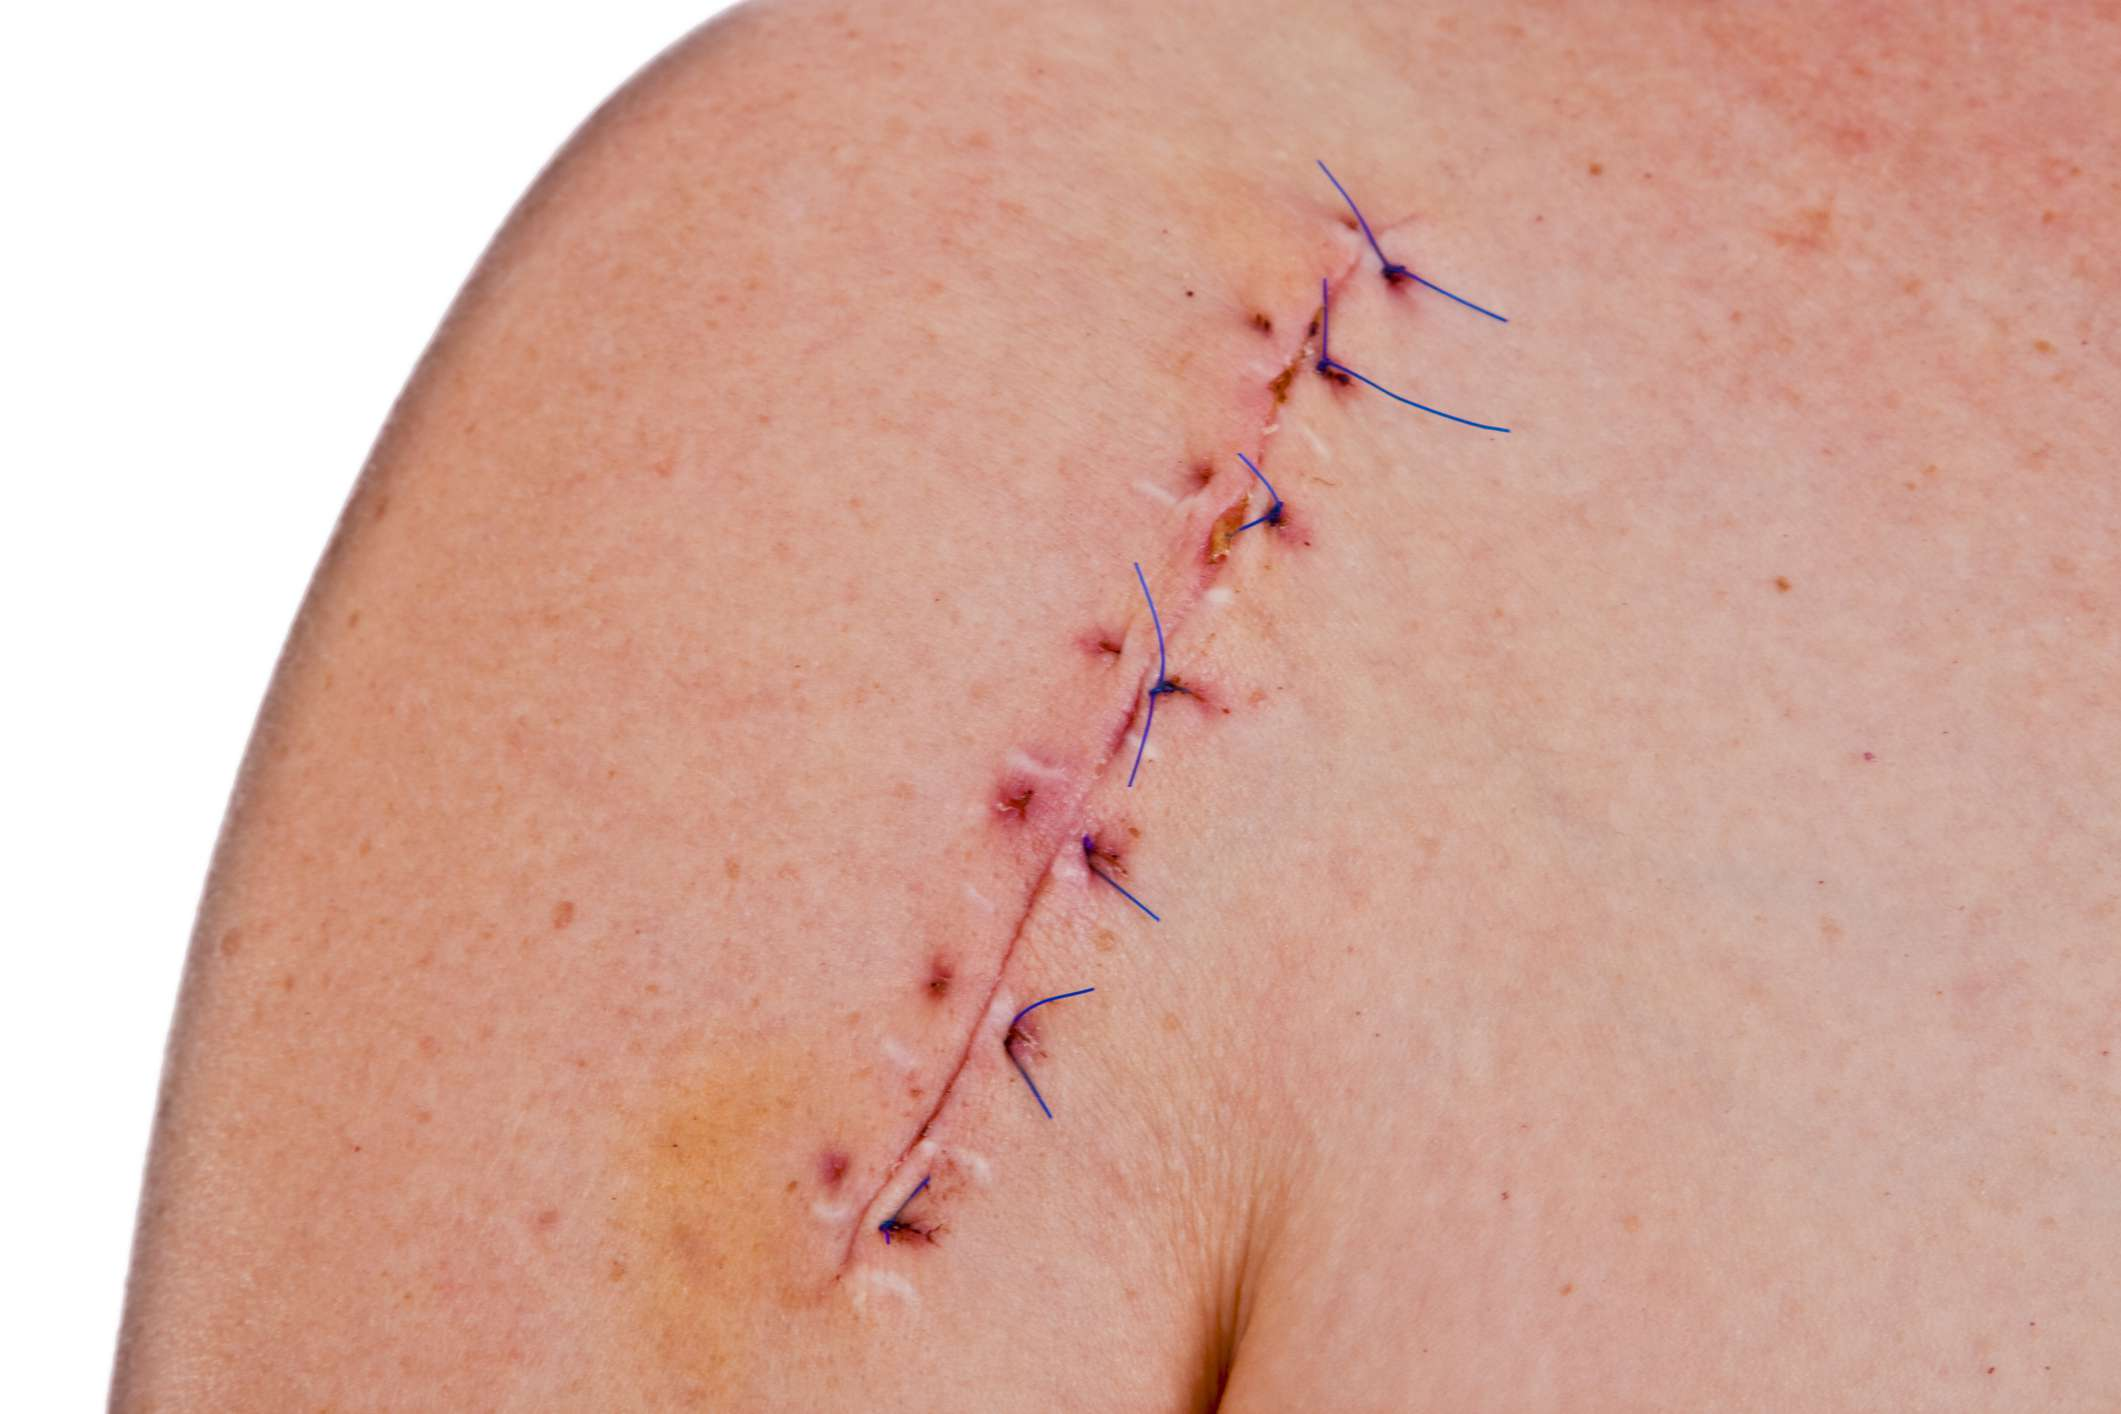 Sutured shoulder surgery incision